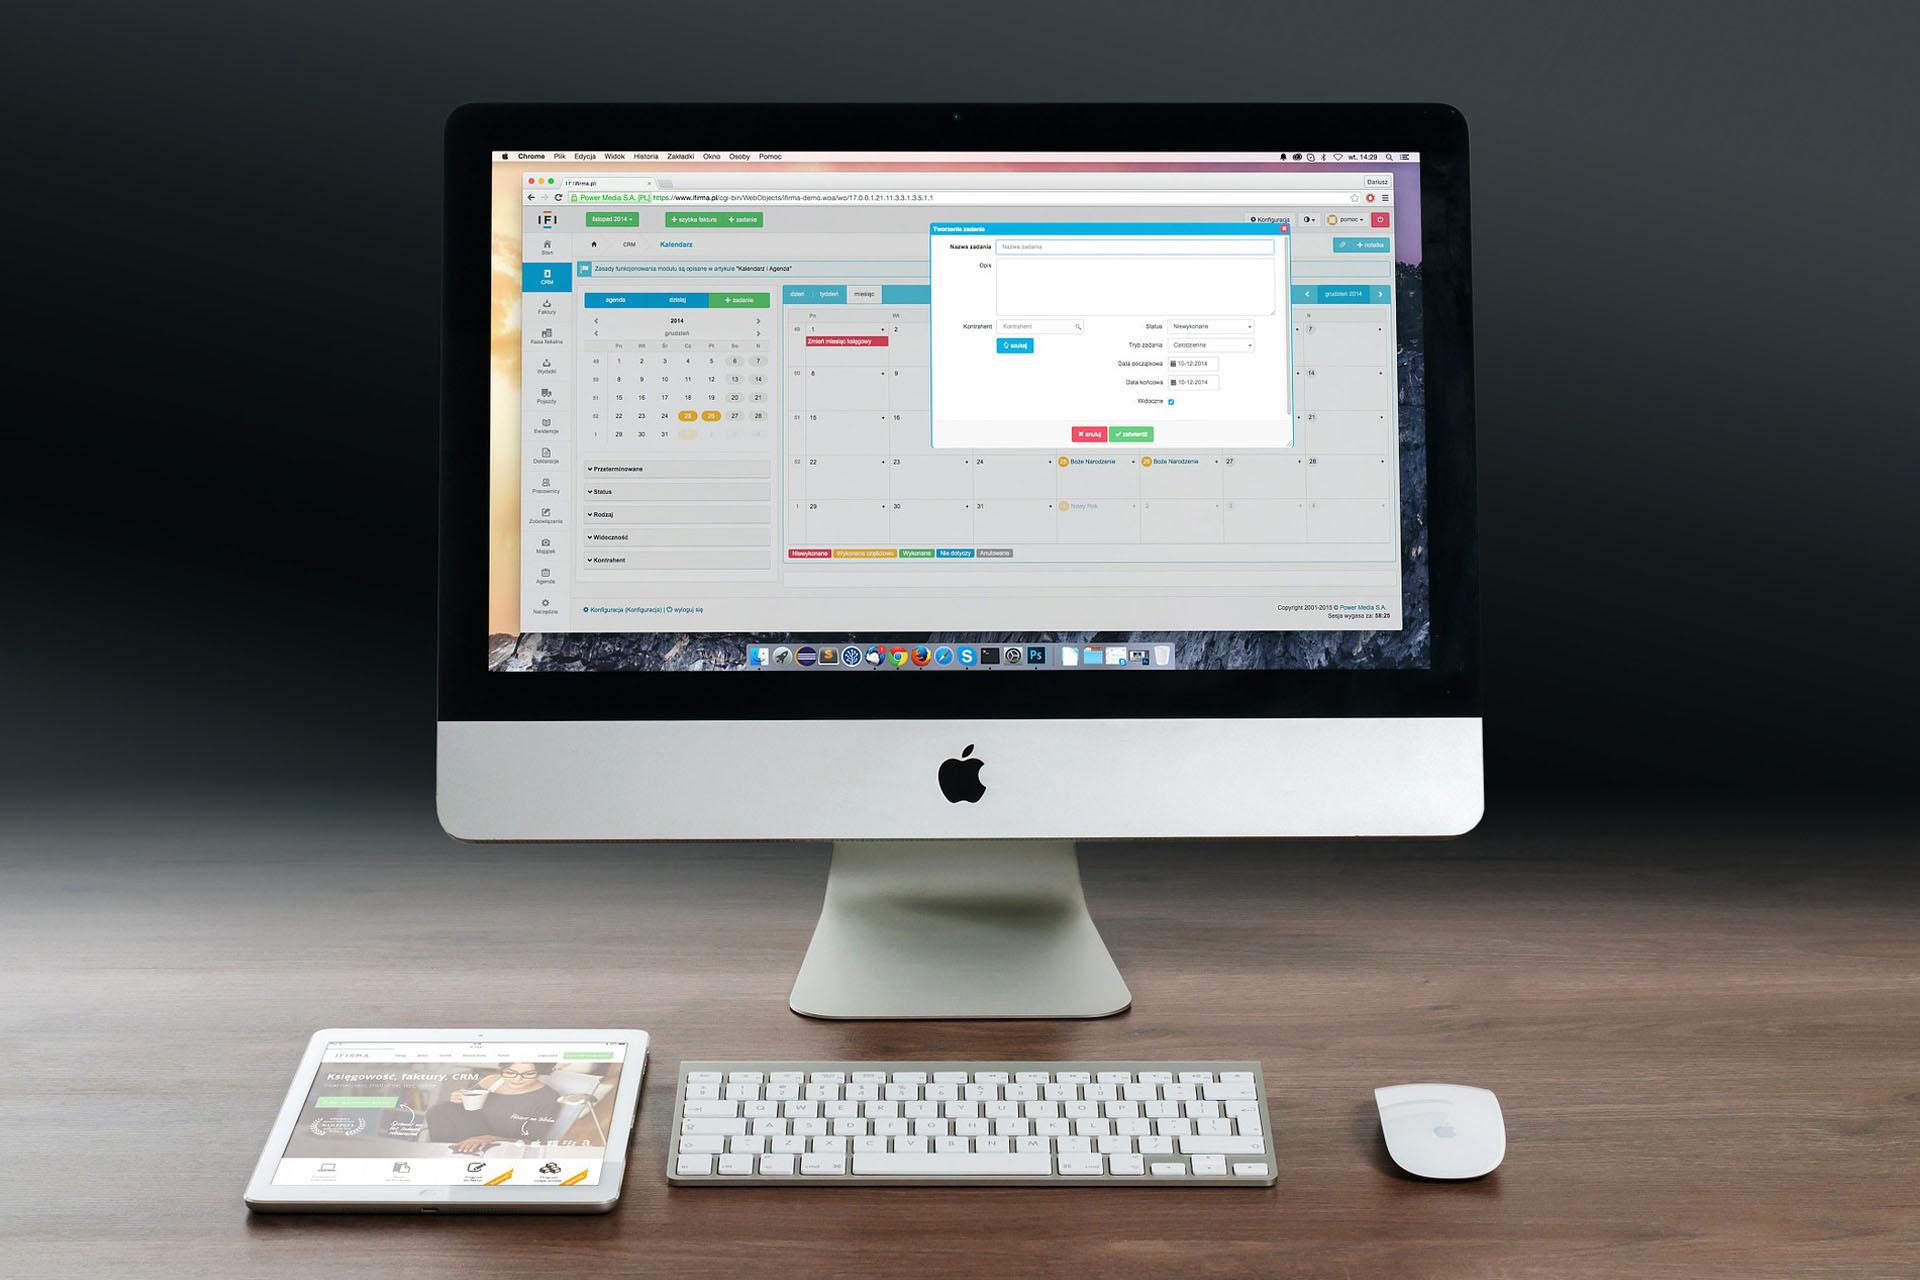 piattaforme software erp gestionale web application multiax italia informatica php mysql sviluppo software software house